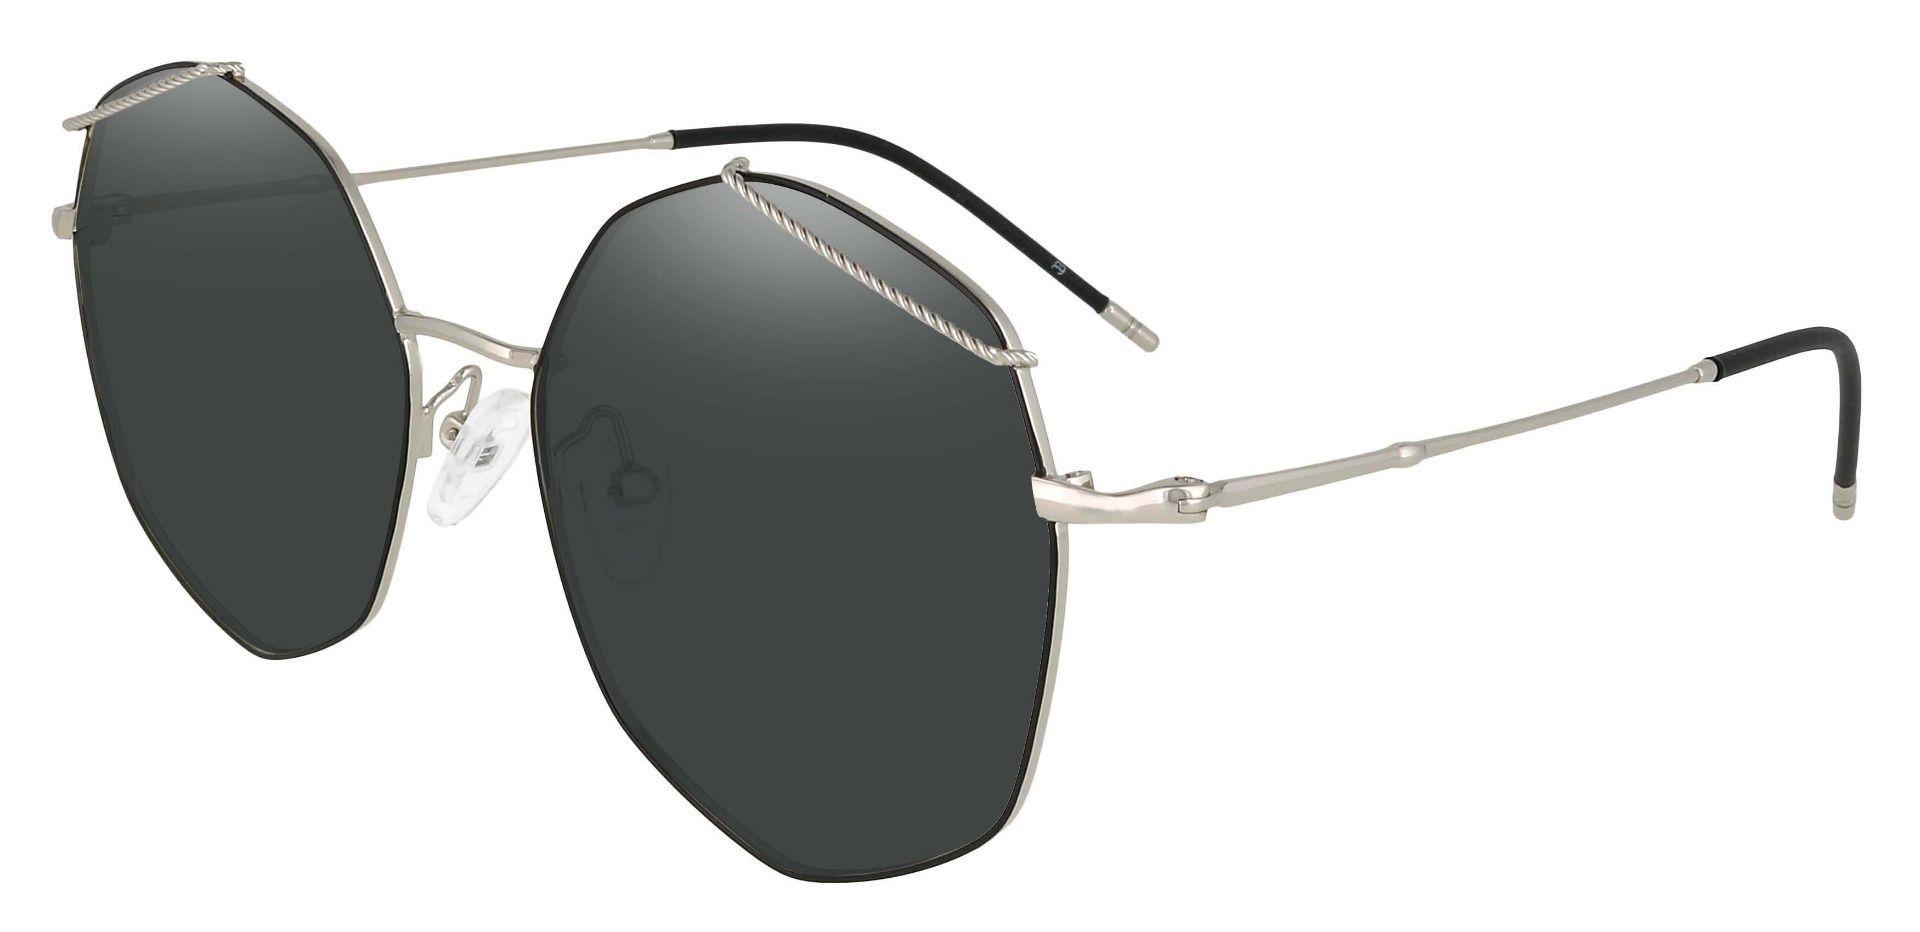 Tango Geometric Reading Sunglasses - Black Frame With Gray Lenses